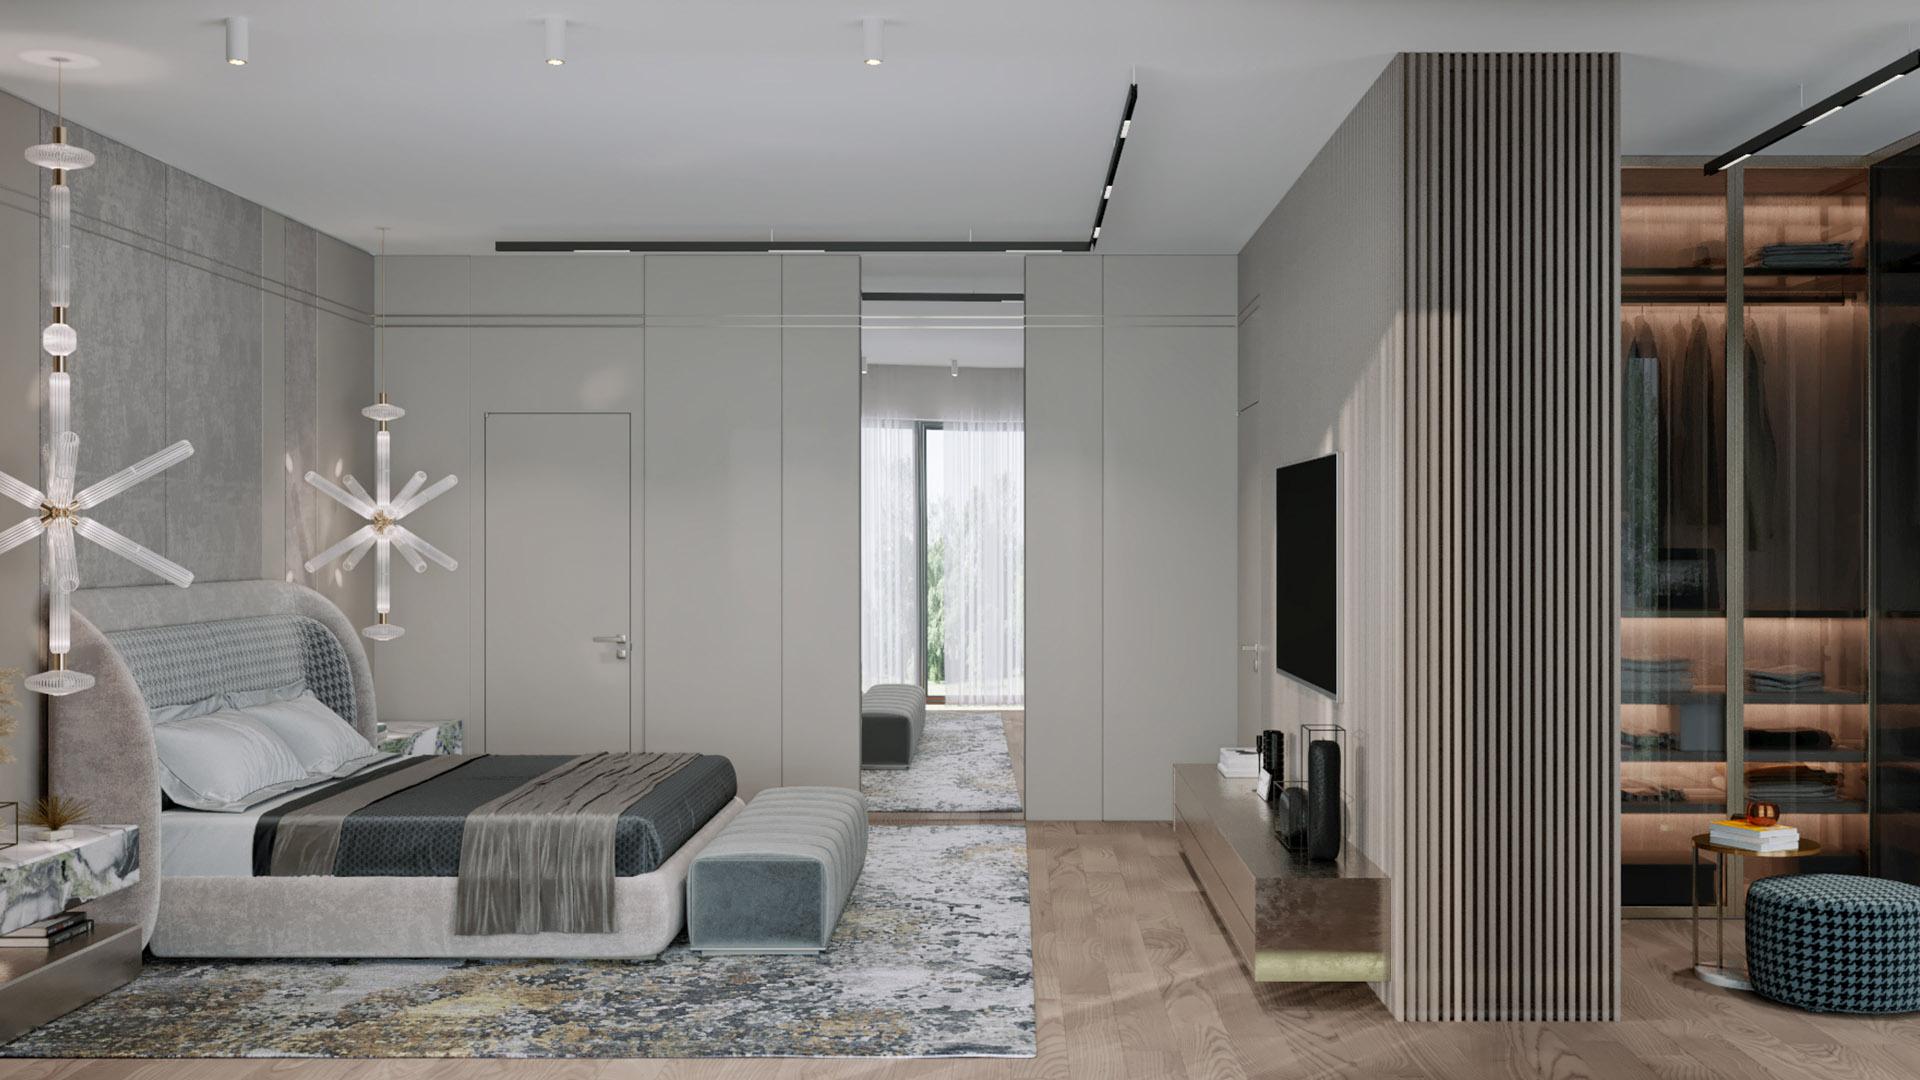 Prodaja stanova Green Hill Dedinje - master spavaća soba, stan G21.